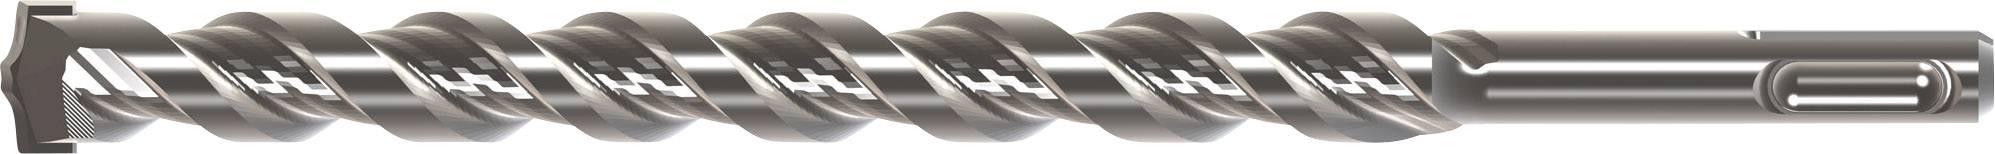 Tvrdý kov kladivový vrták Heller 156271, 8 mm, 210 mm, 1 ks